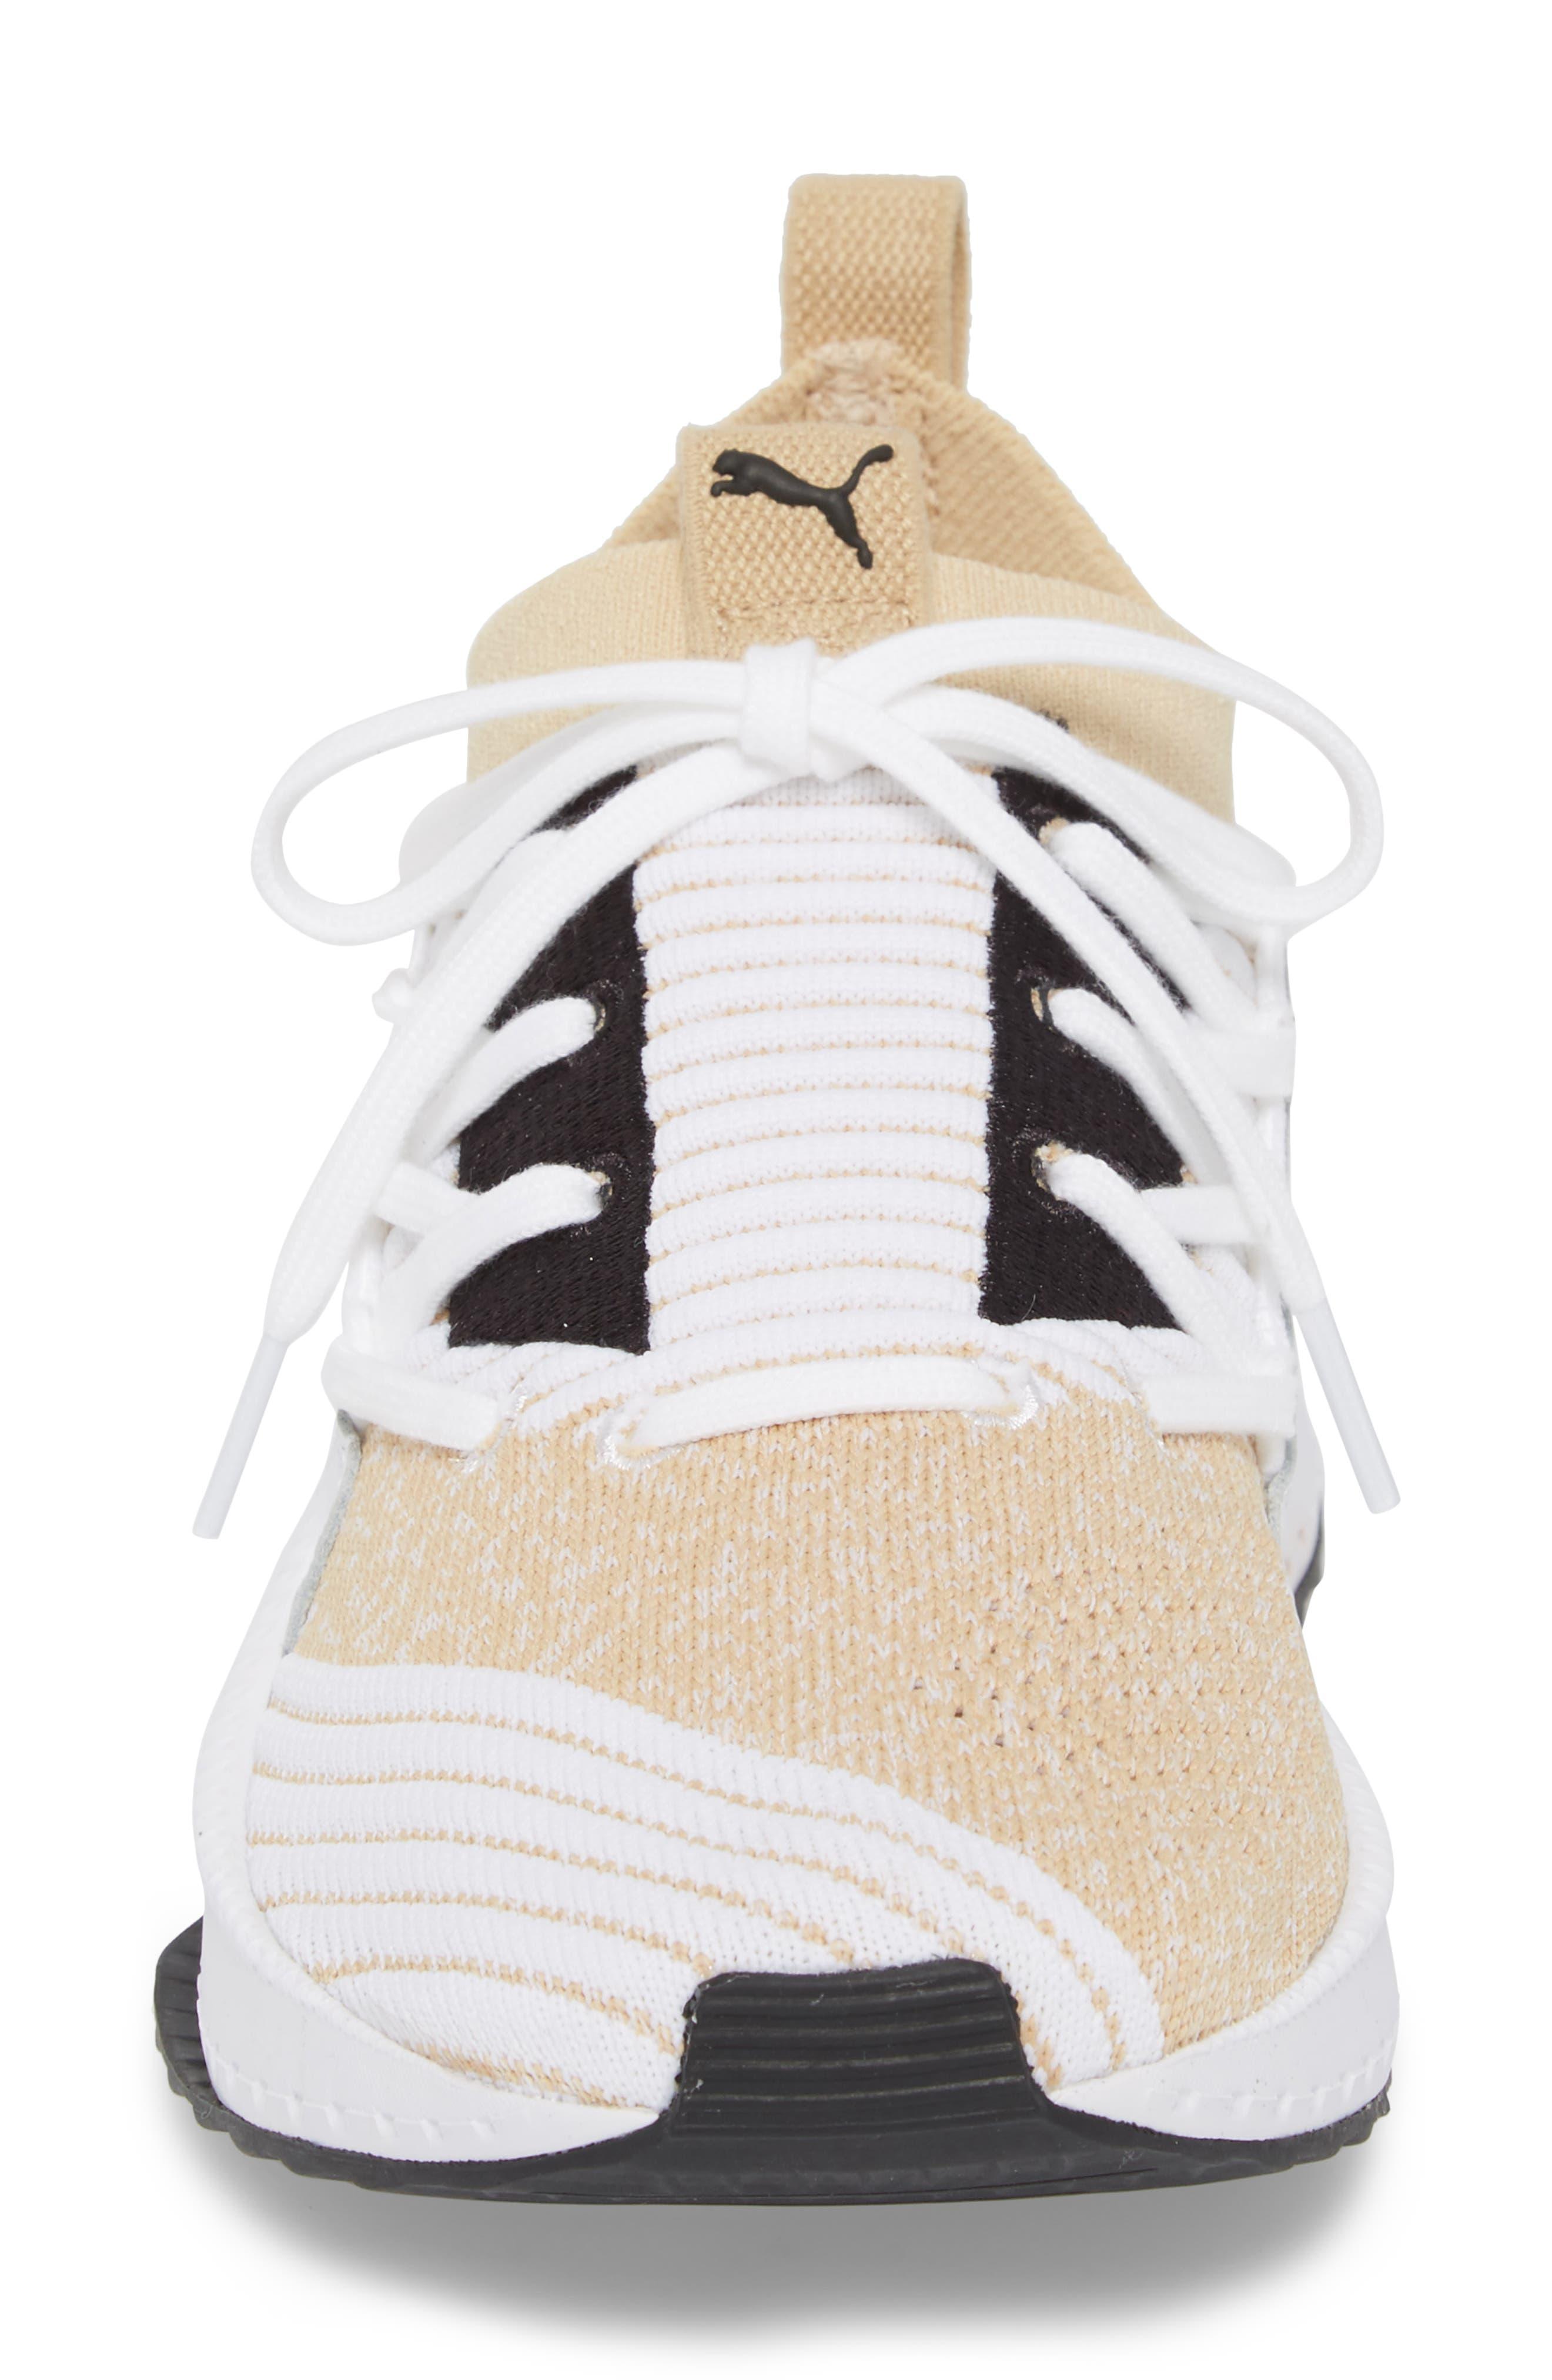 Tsugi Jun Knit Sneaker,                             Alternate thumbnail 25, color,